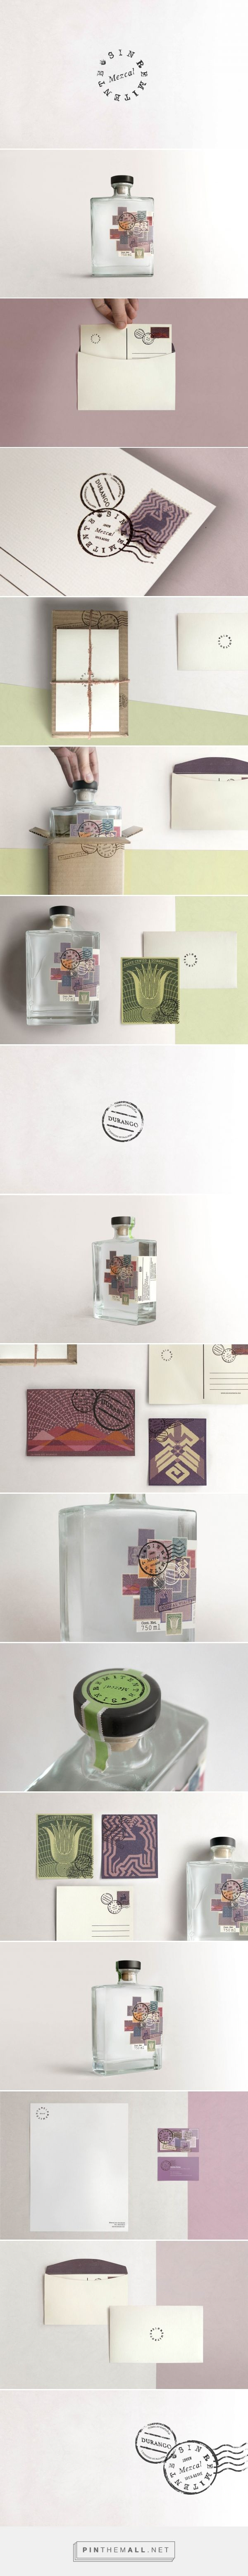 SIN REMITENTE mezcal Branding by TORO PINTO | Fivestar Branding – Design and Branding Agency & Inspiration Gallery